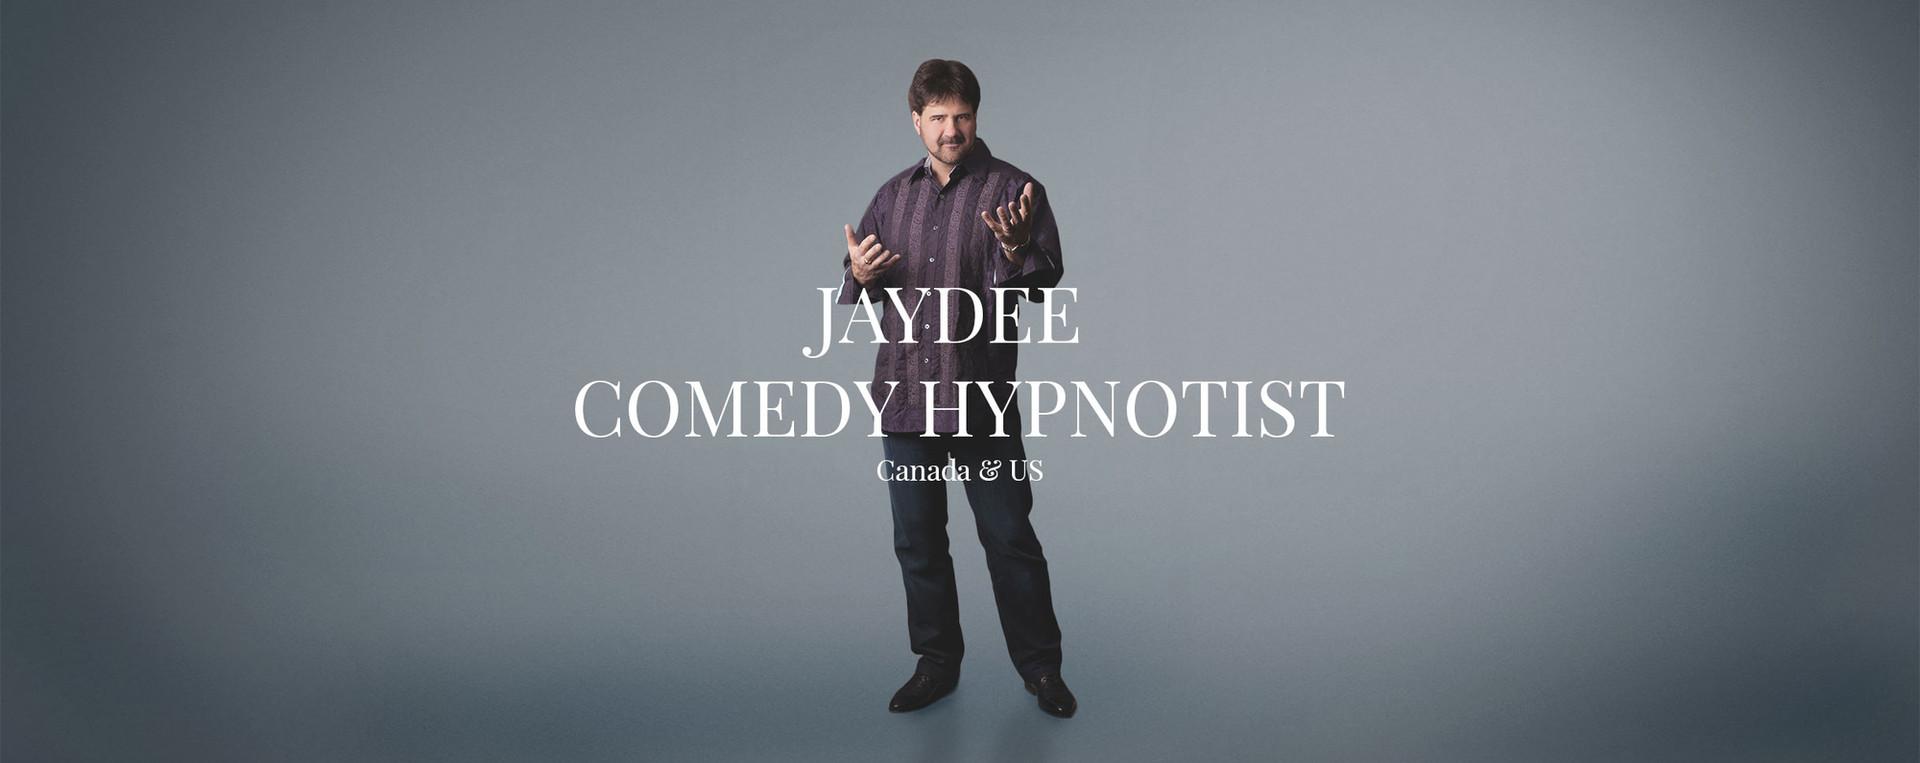 JayDee Hypnotist